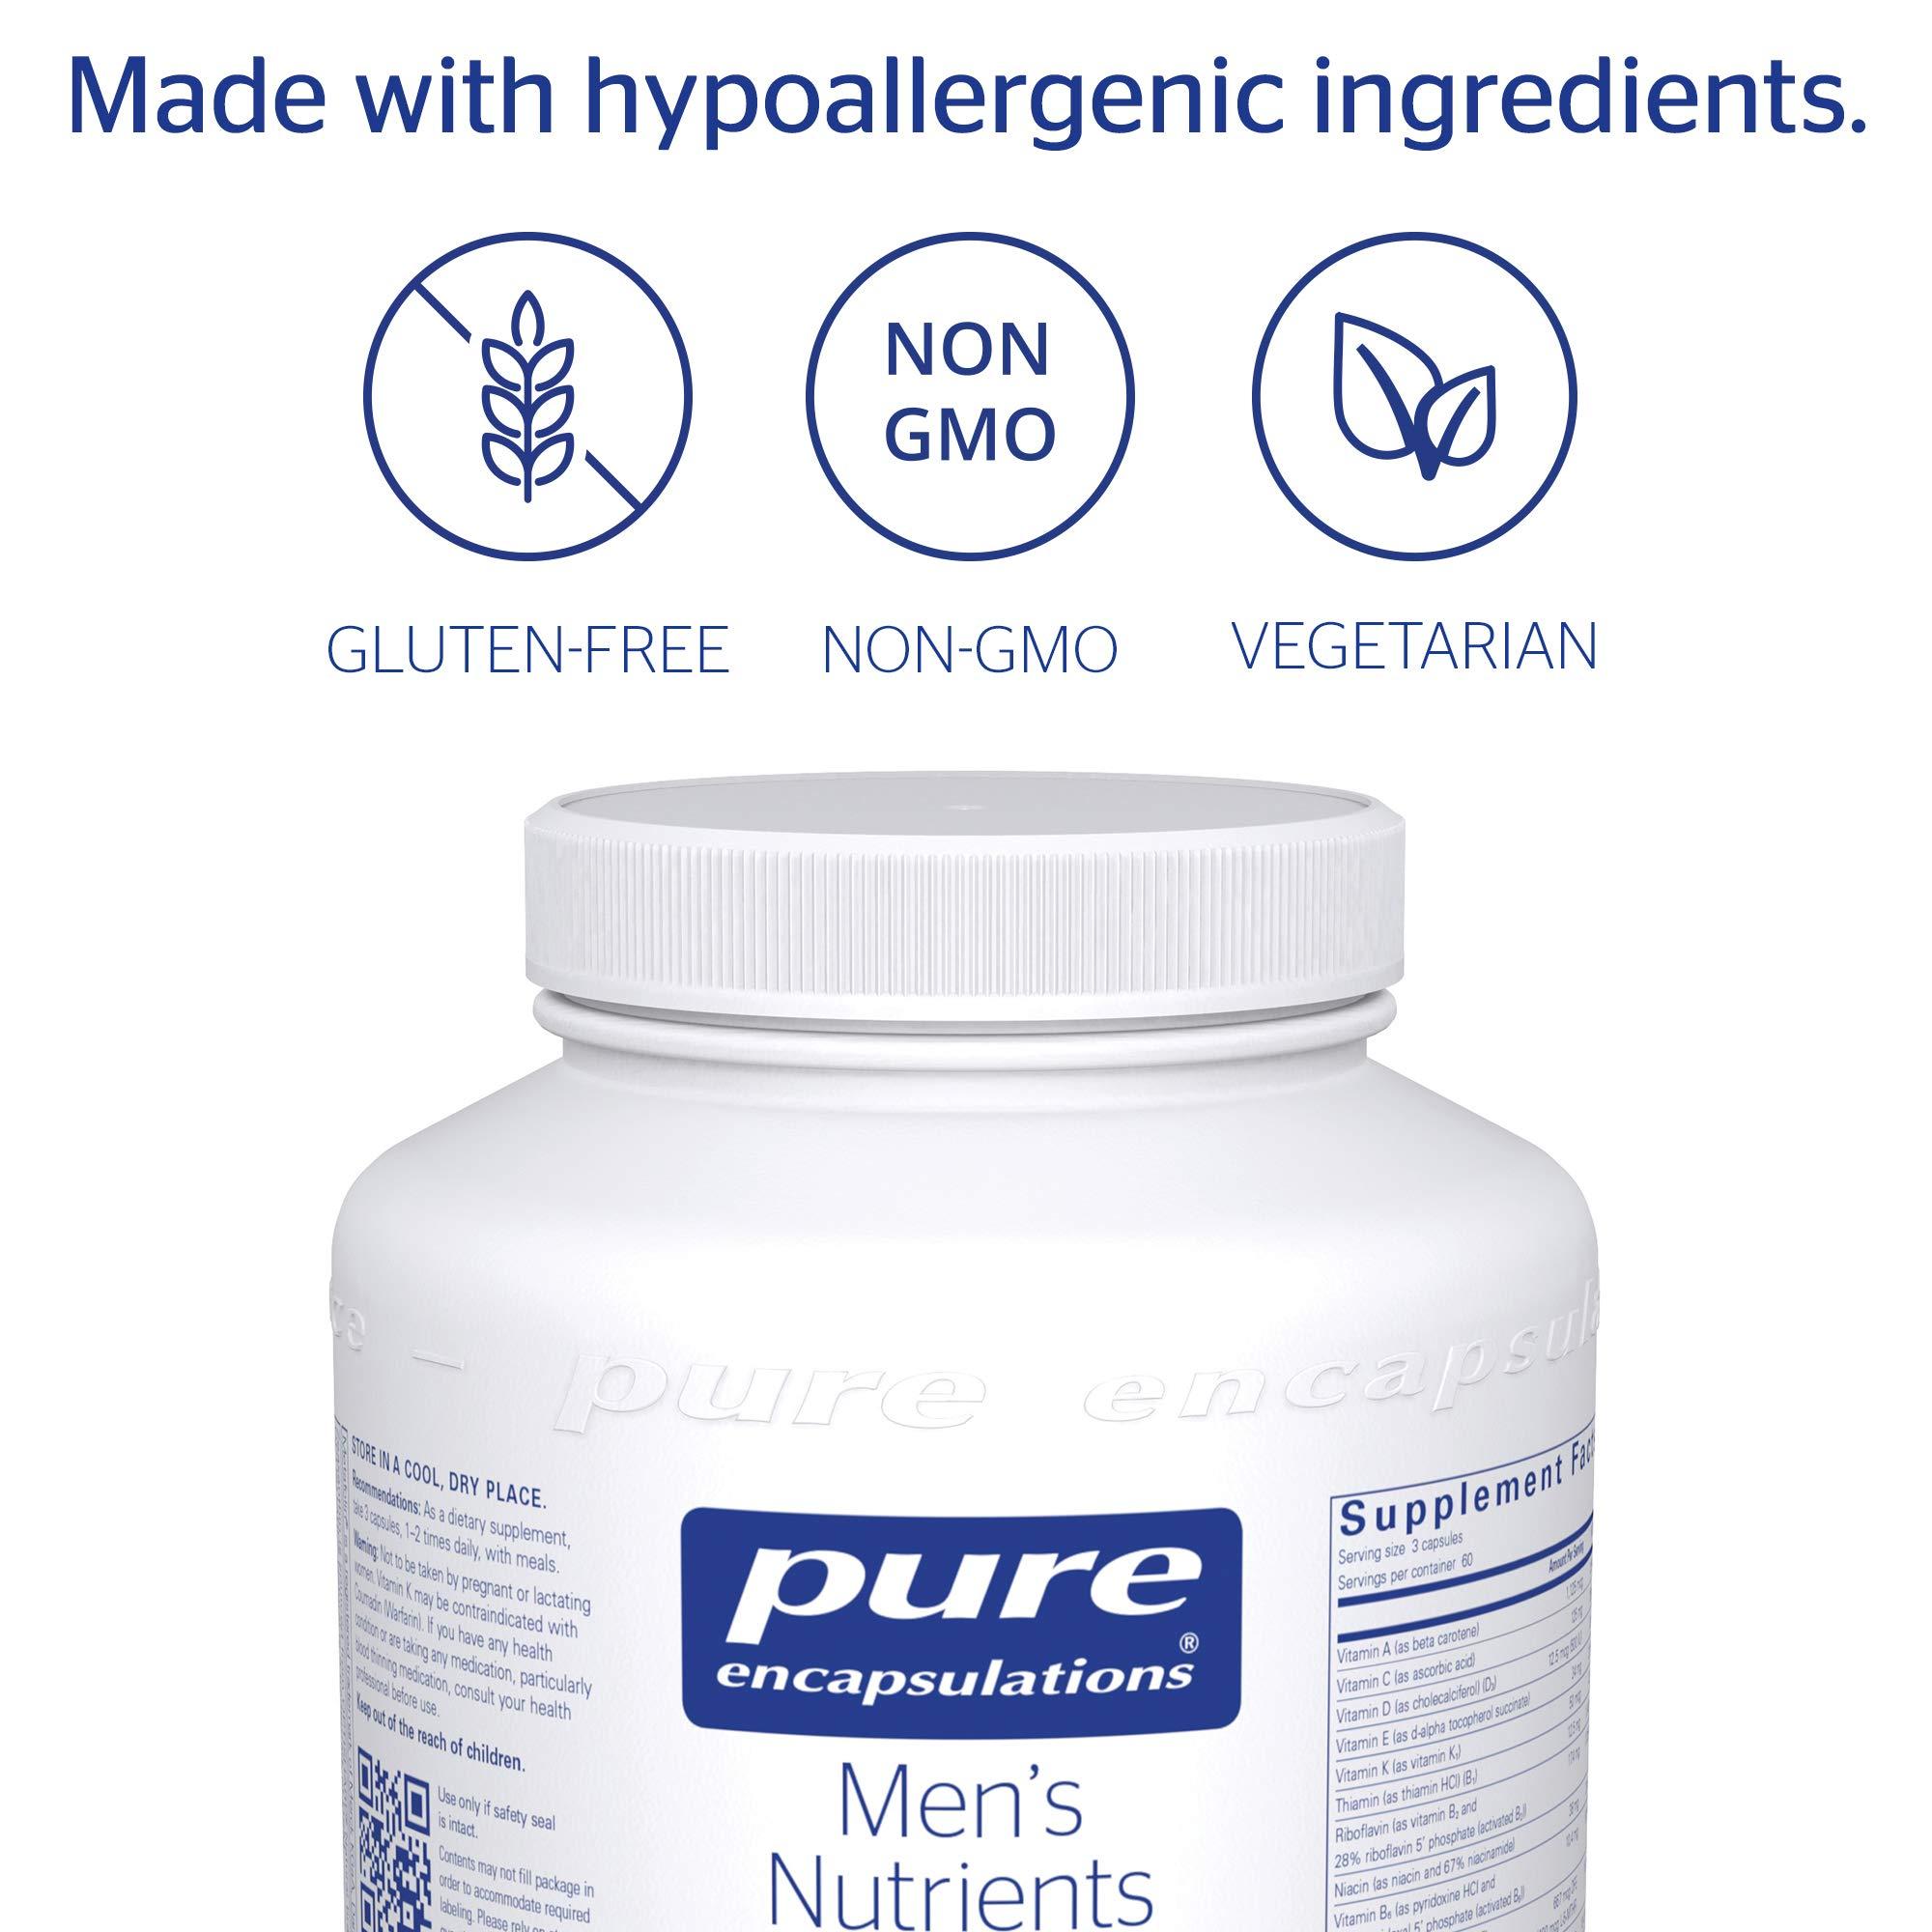 Pure Encapsulations - Men's Nutrients - Hypoallergenic Multivitamin/Mineral Complex for Men Over 40-180 Capsules by Pure Encapsulations (Image #4)